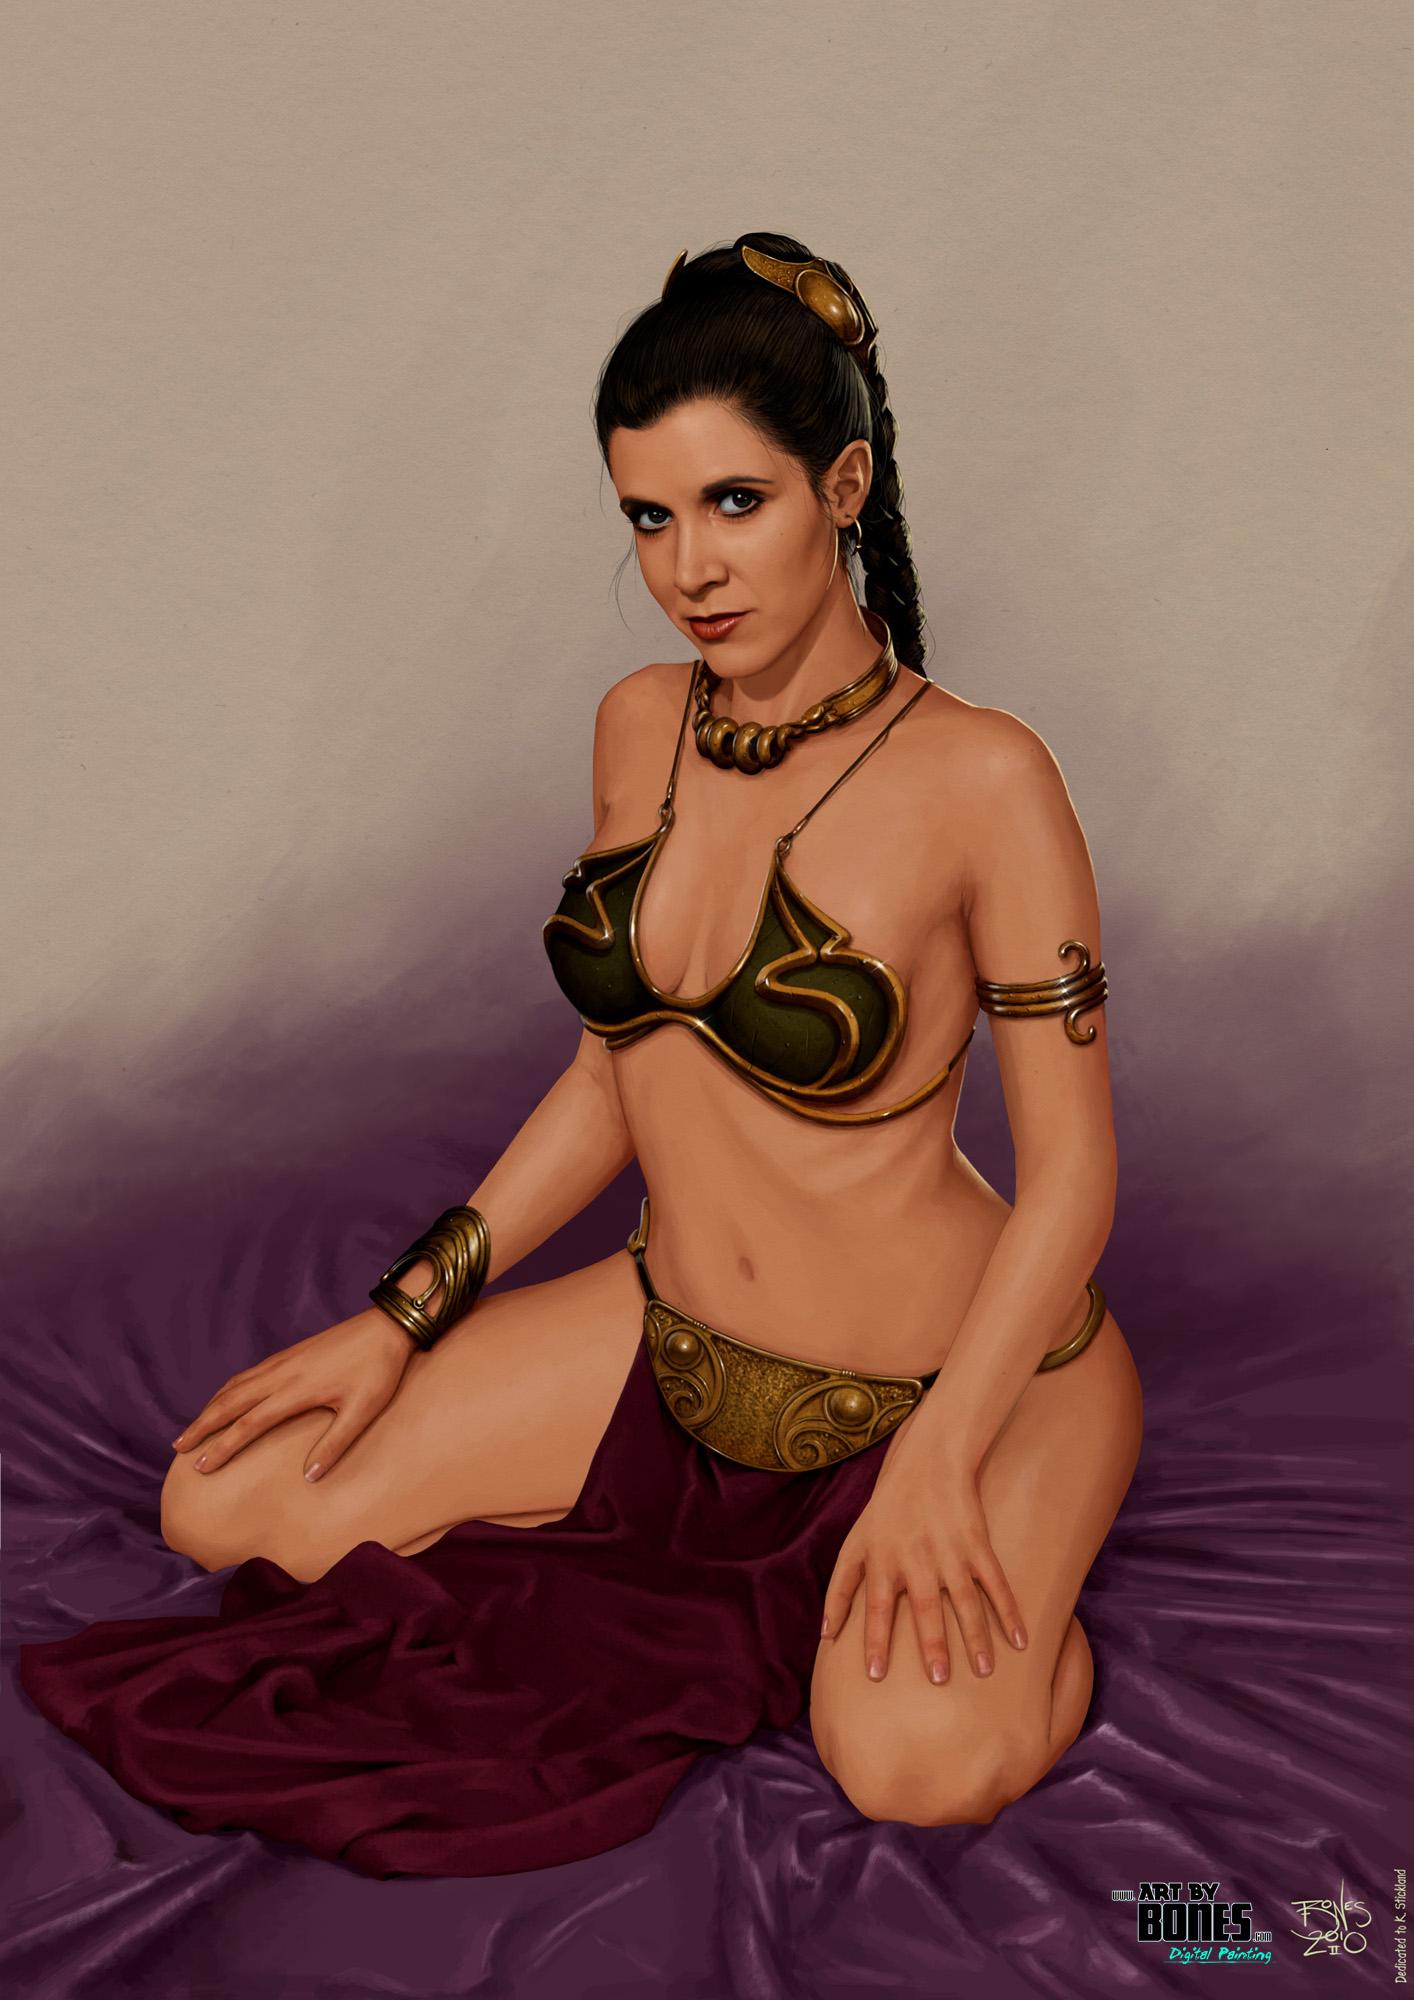 Cosplay slave leia wars star princess